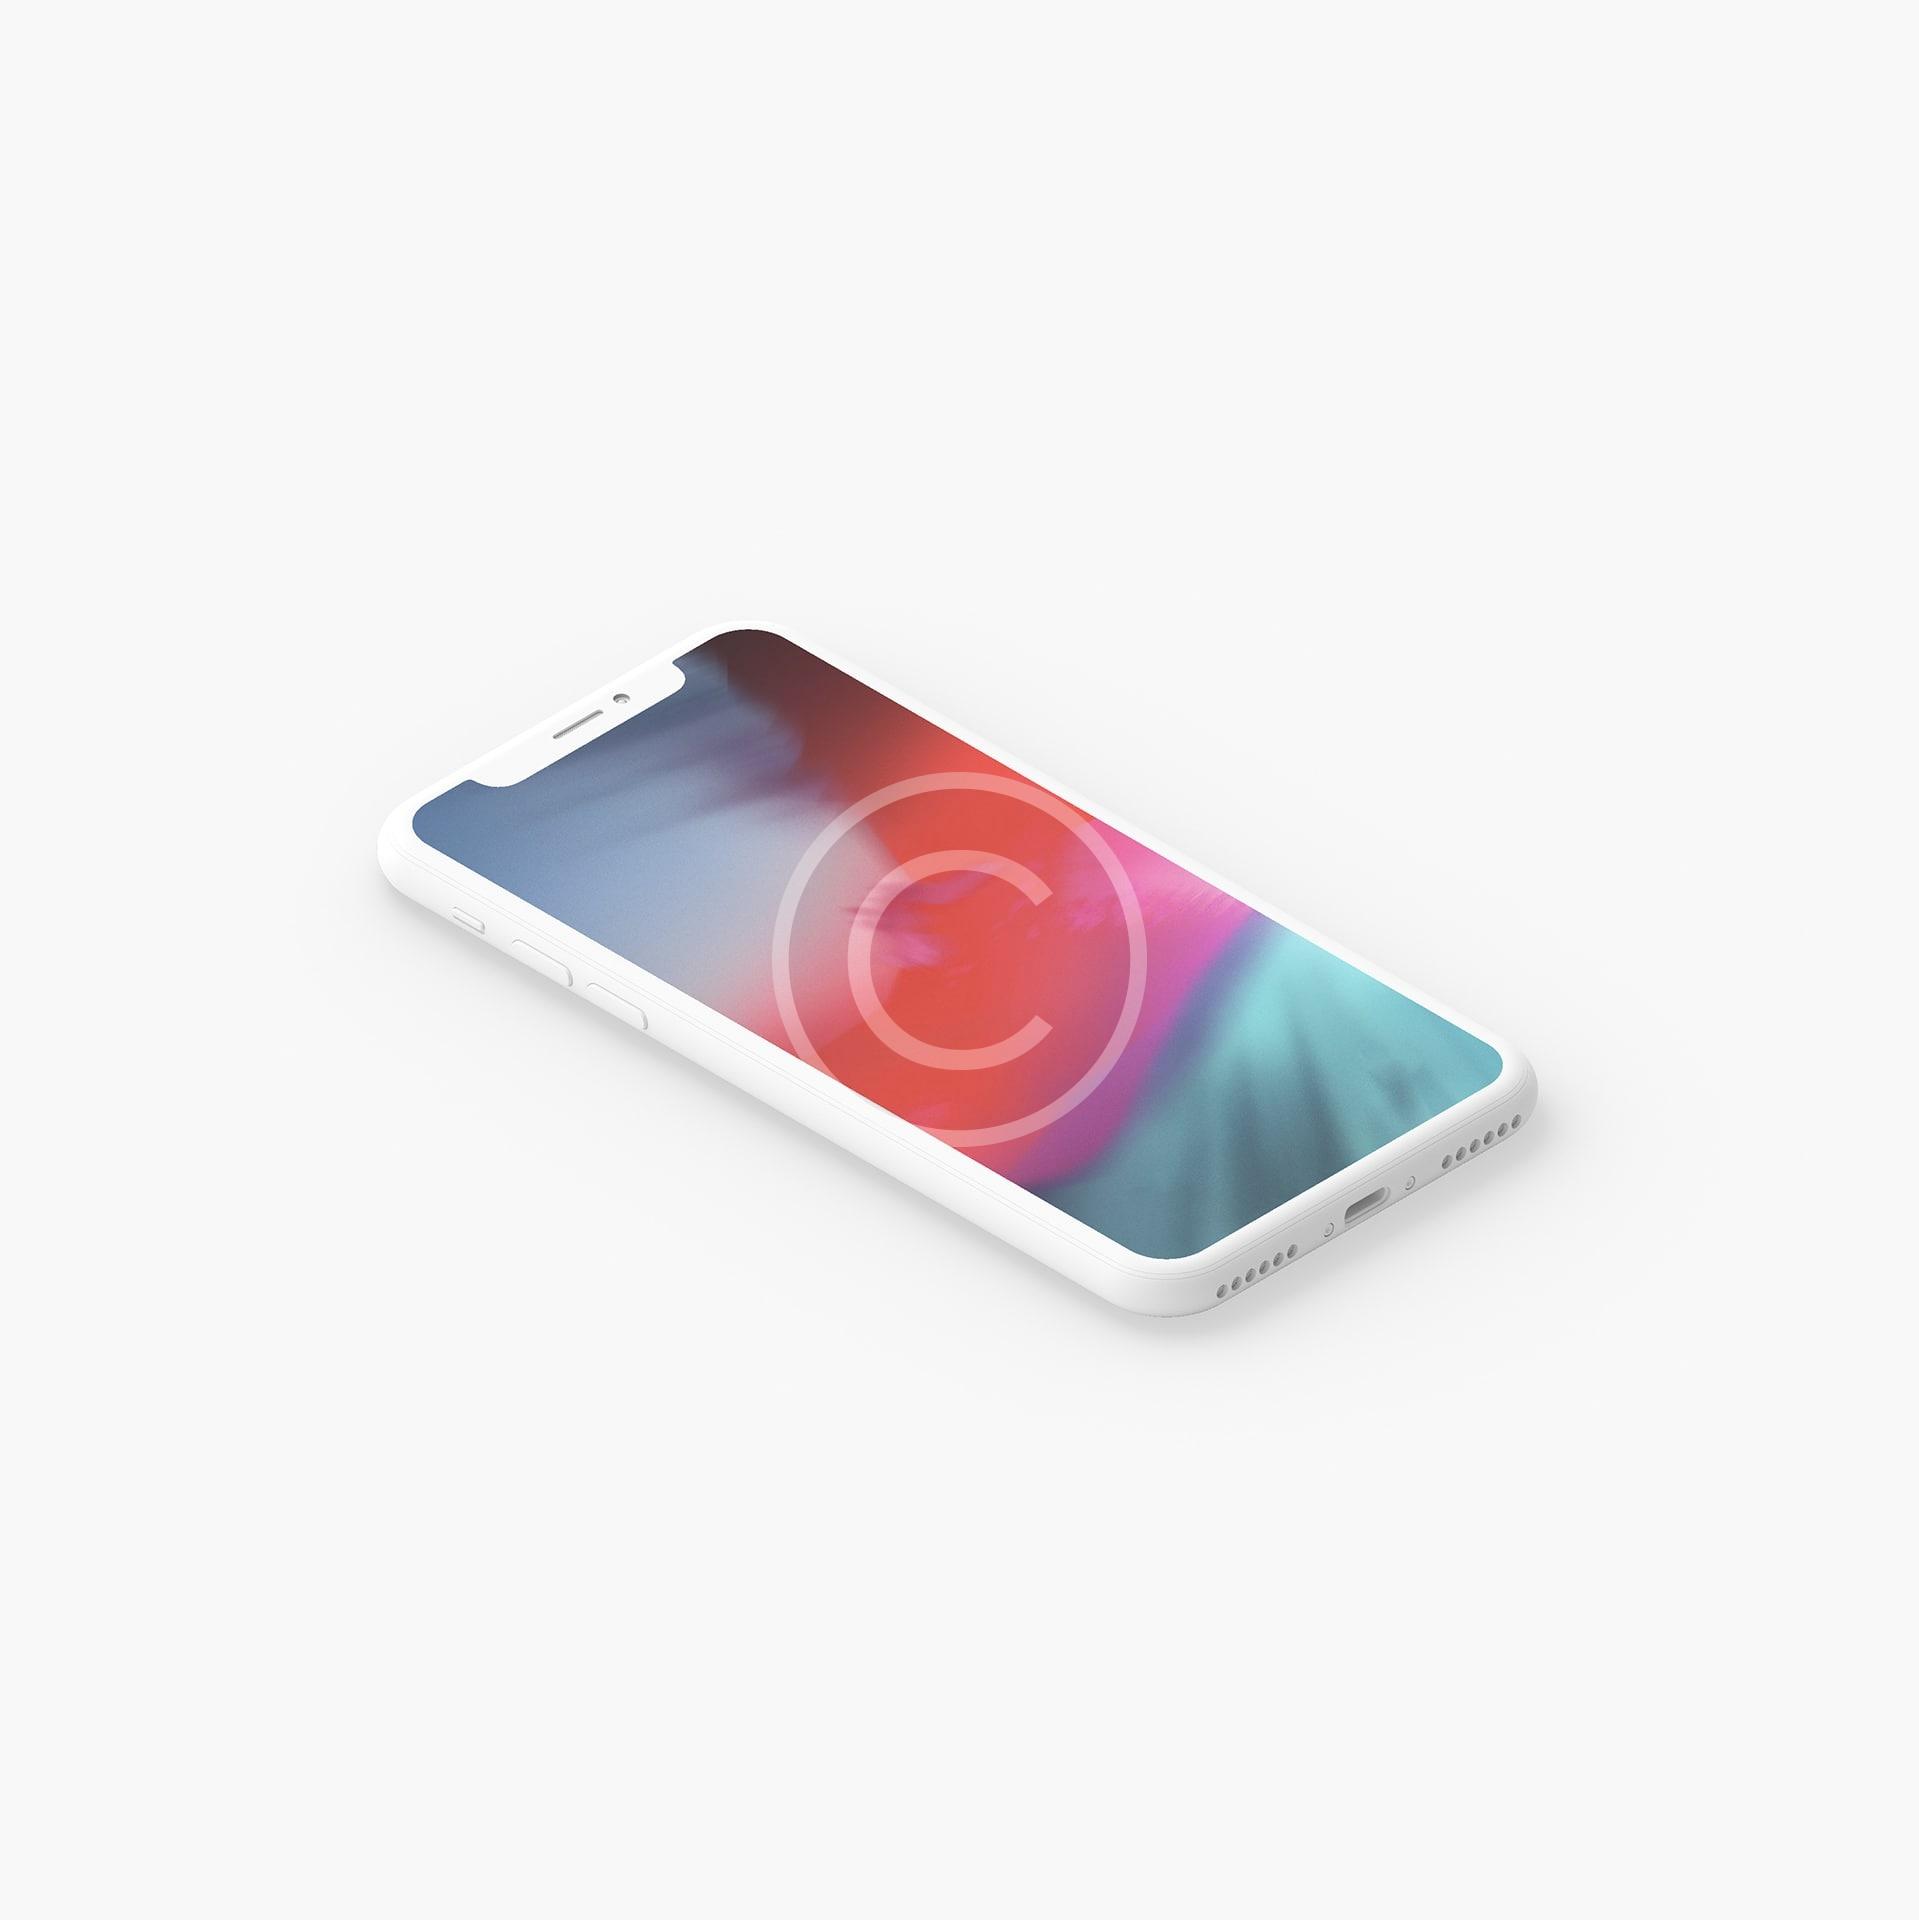 Phone Product Design